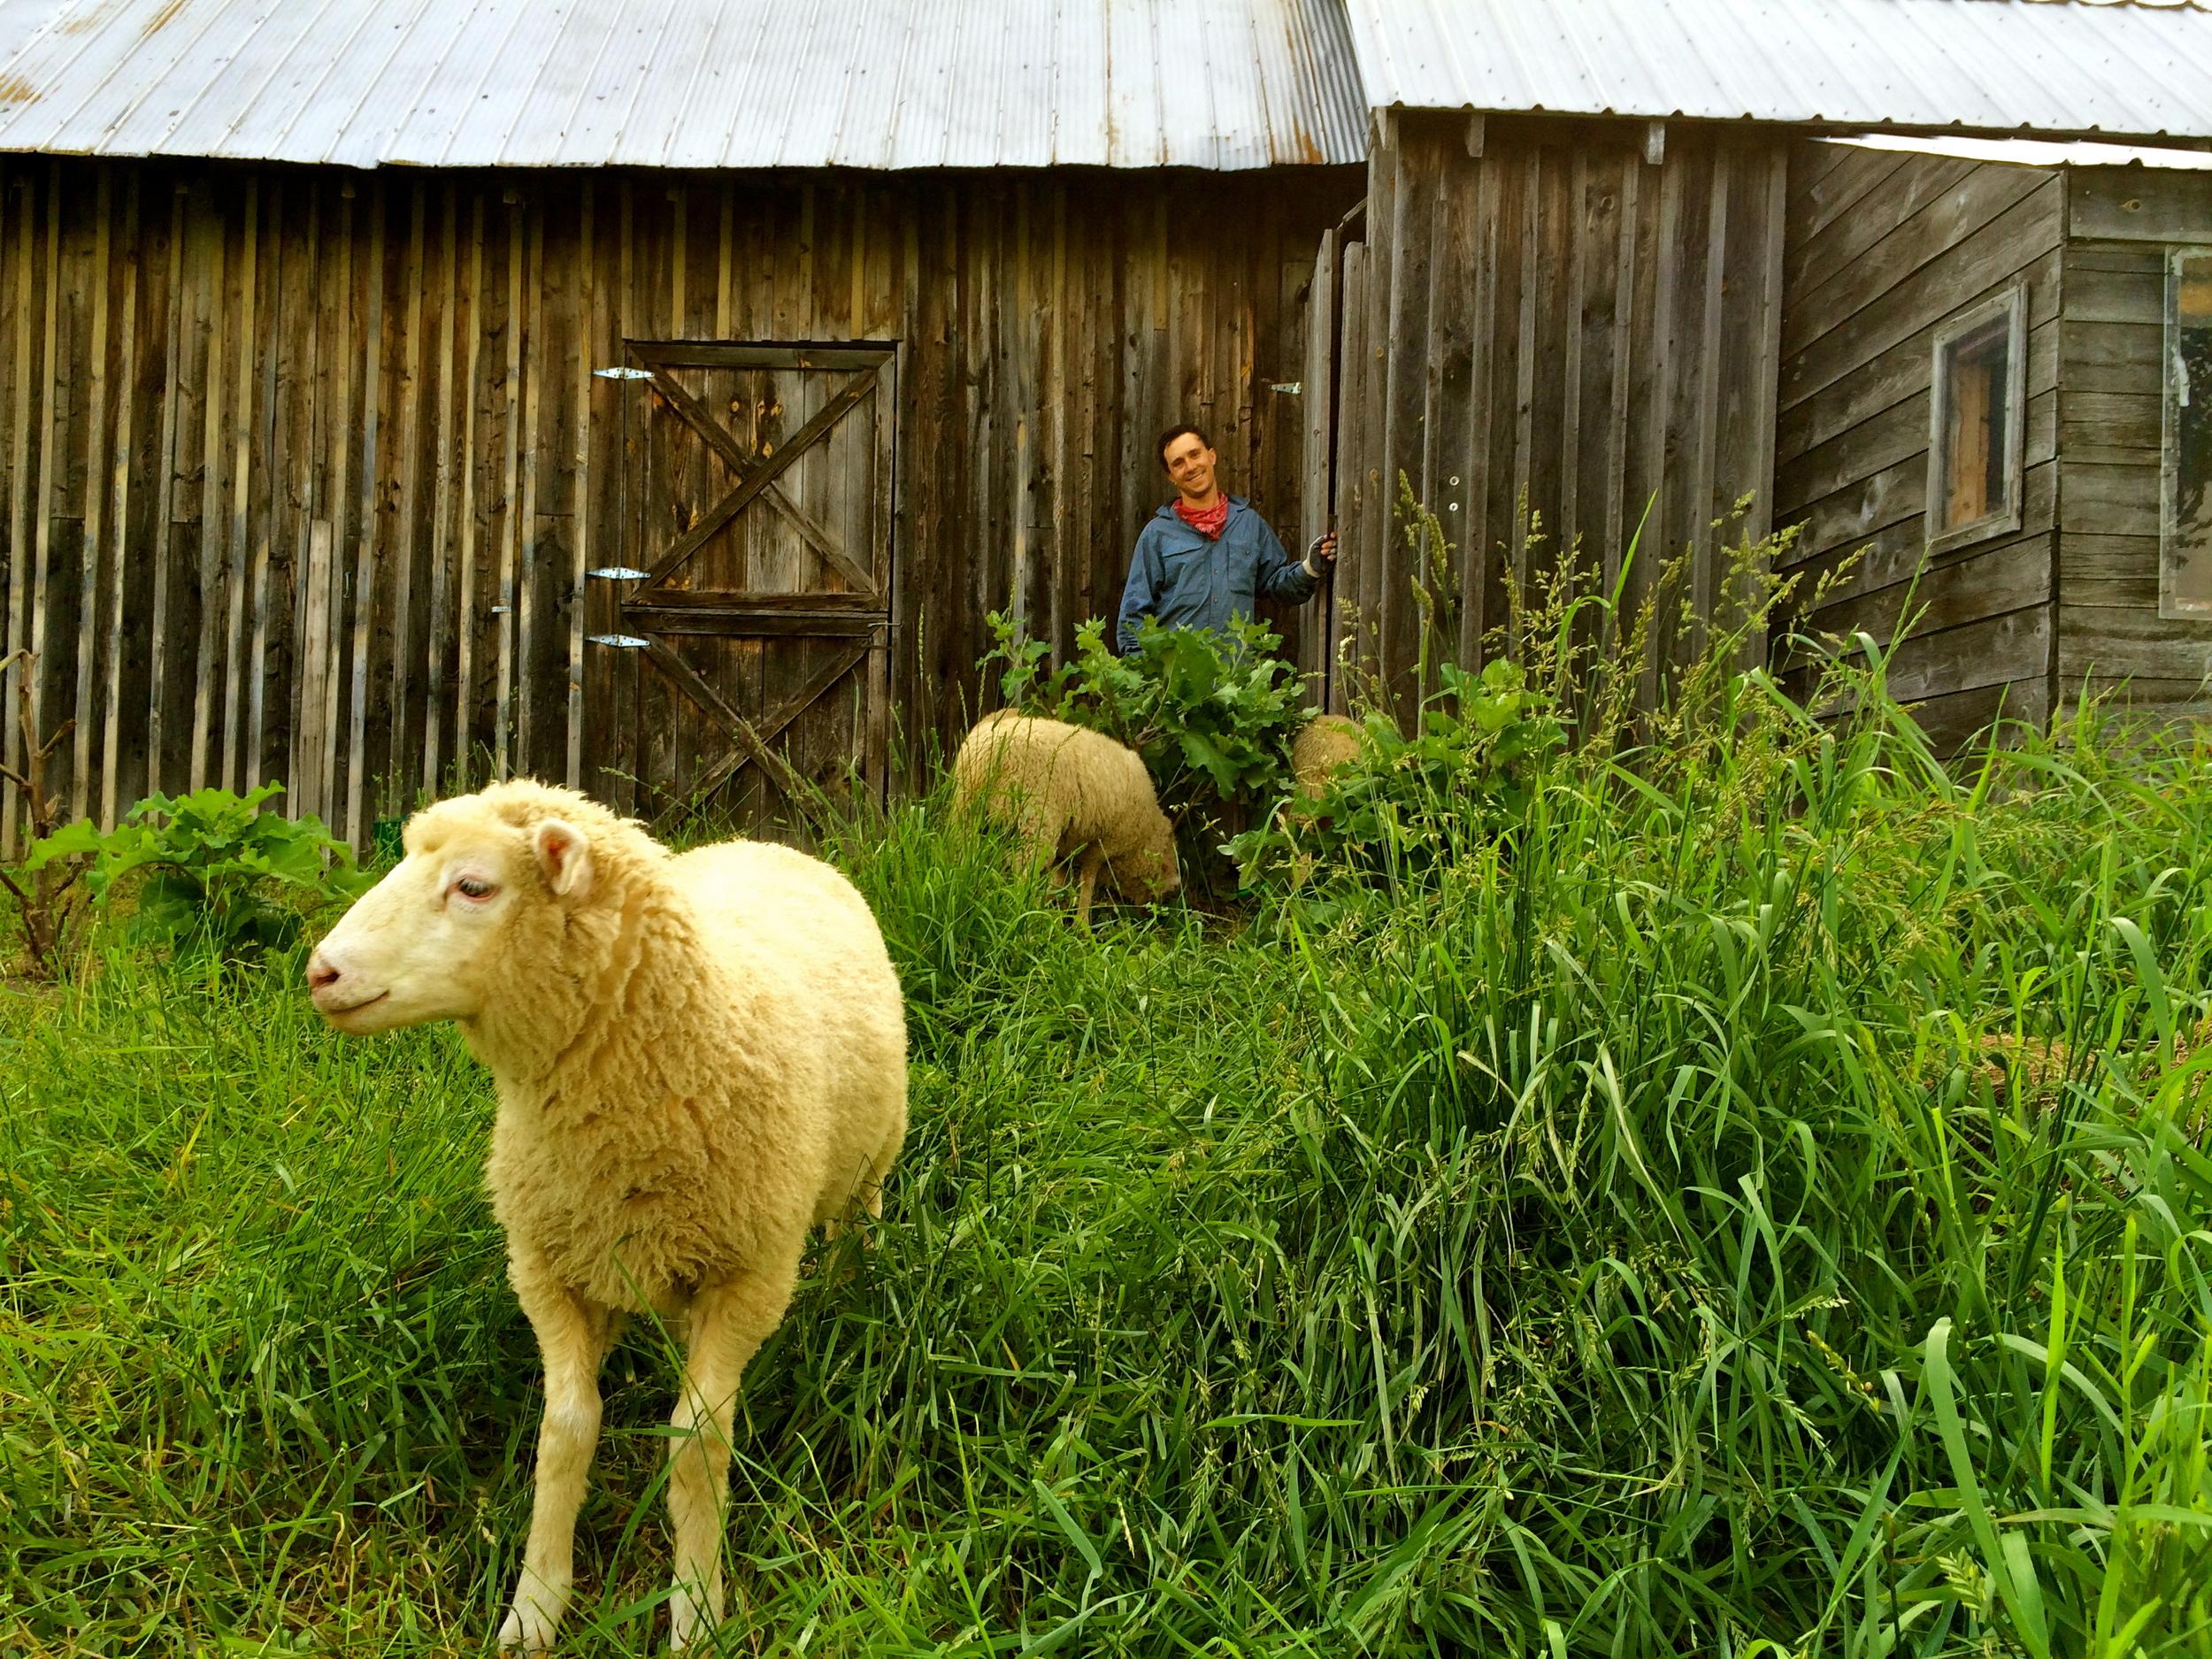 Jason at Wild Rhythms Farm Photo Credit Caitlin Elberson